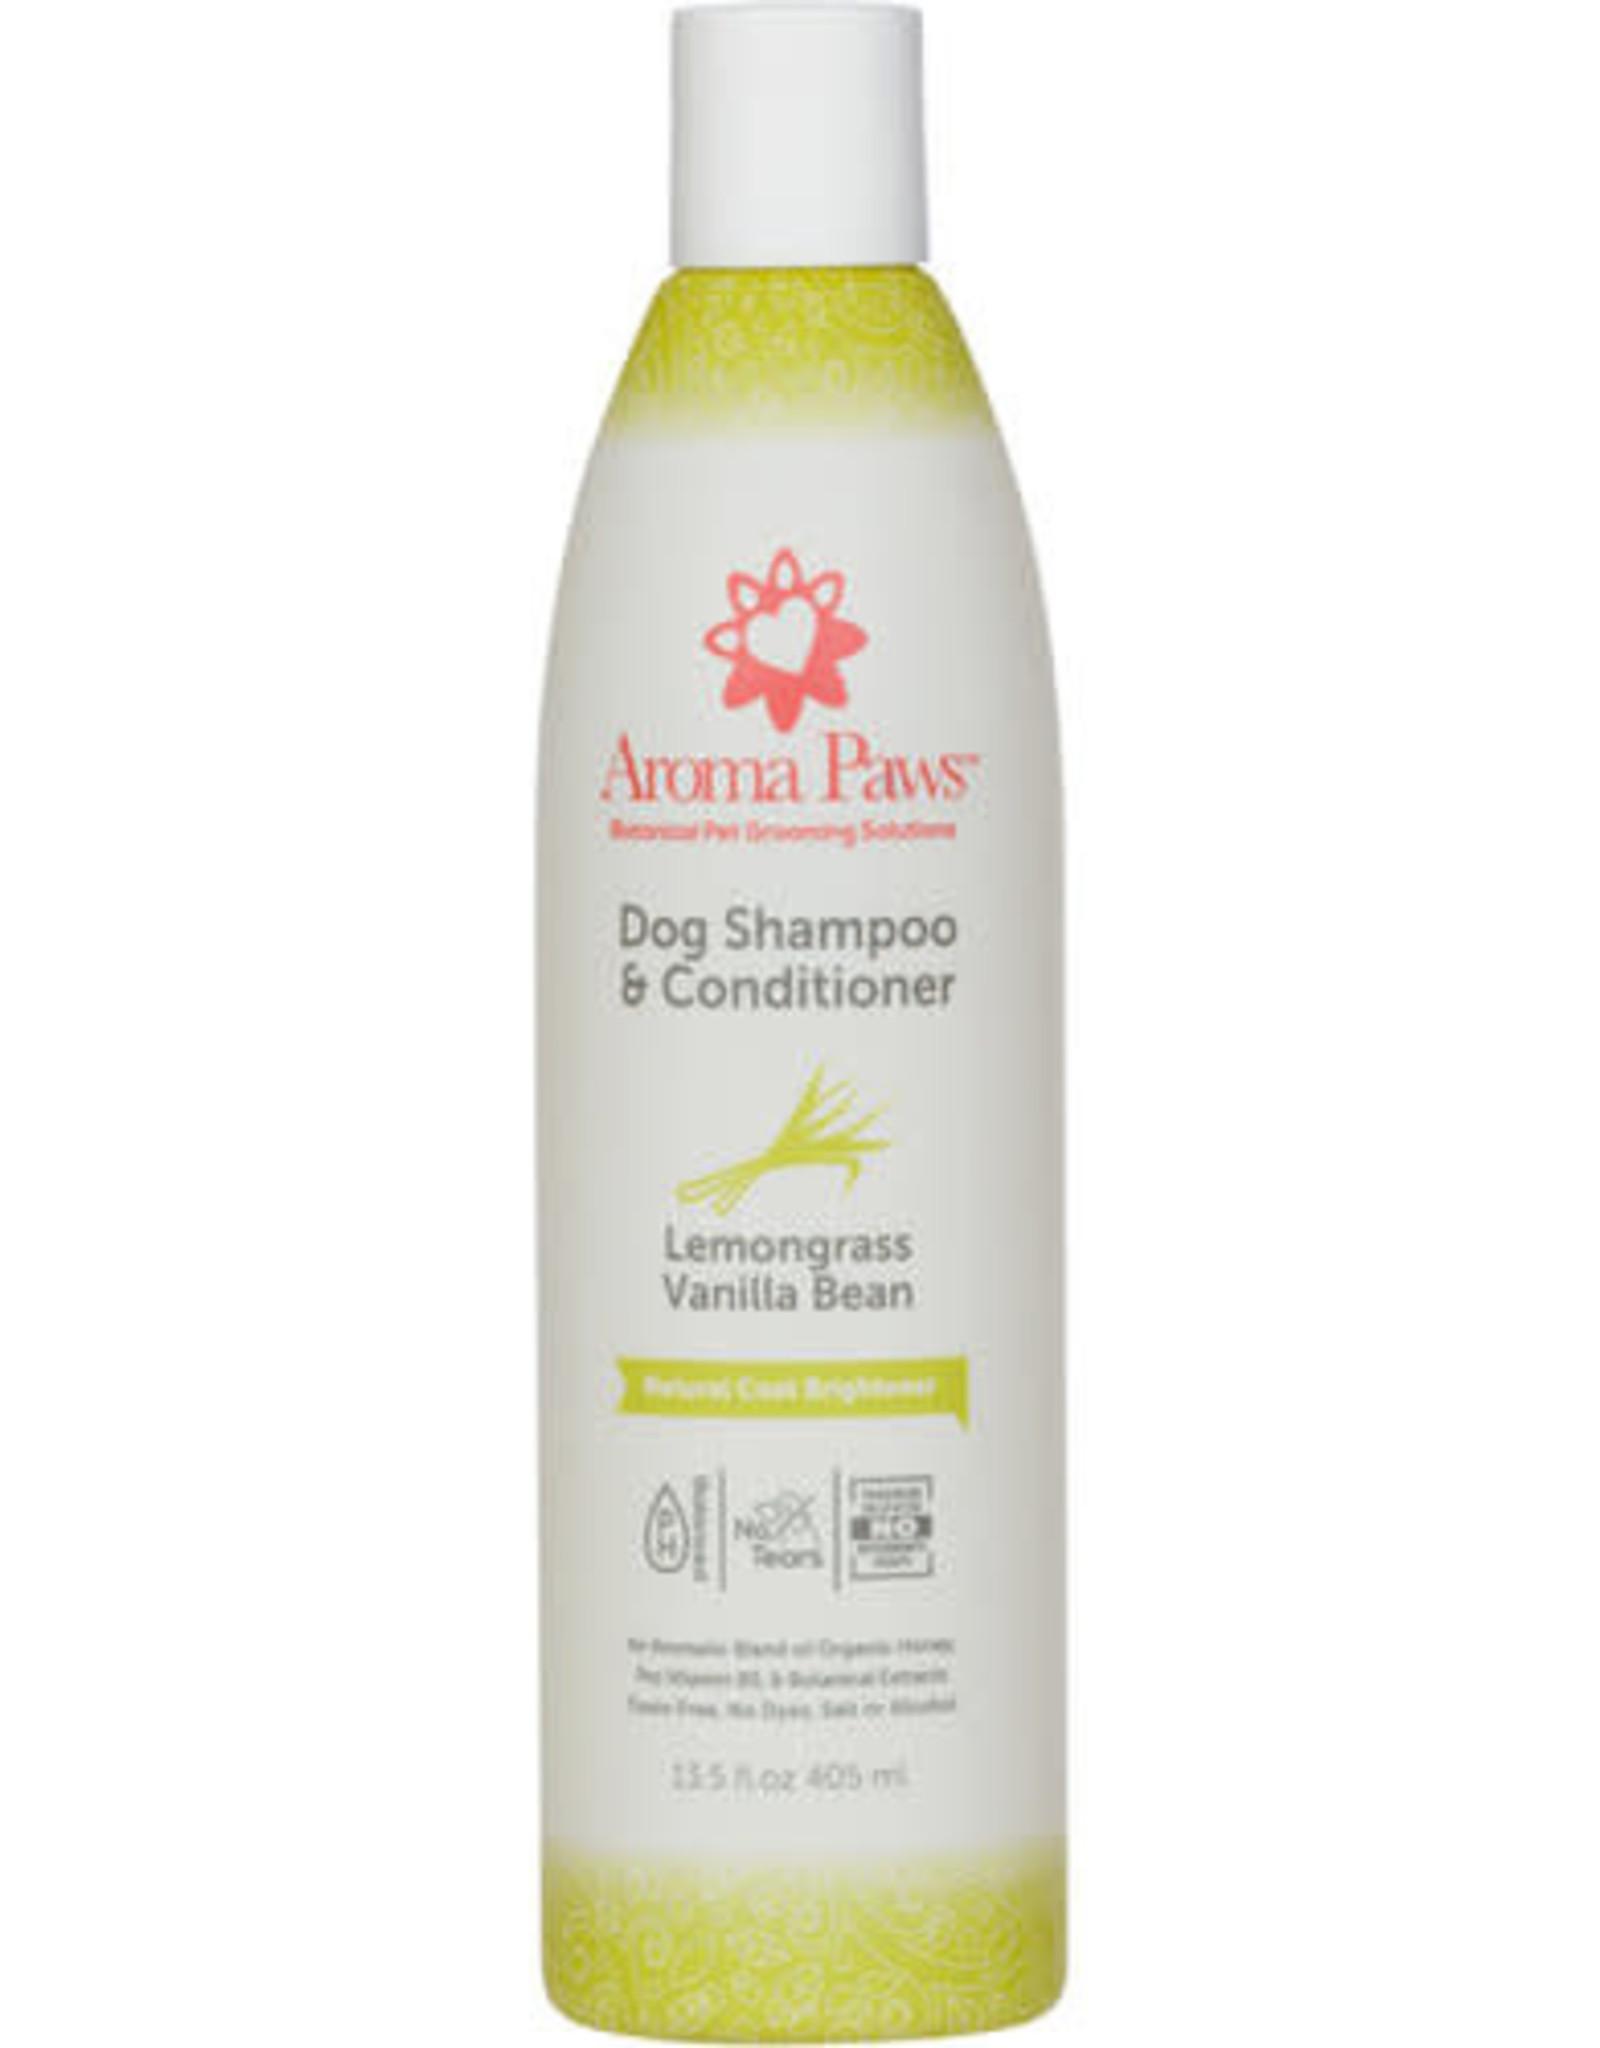 Lemongrass Vanilla Shampoo & Conditioner 13.5oz